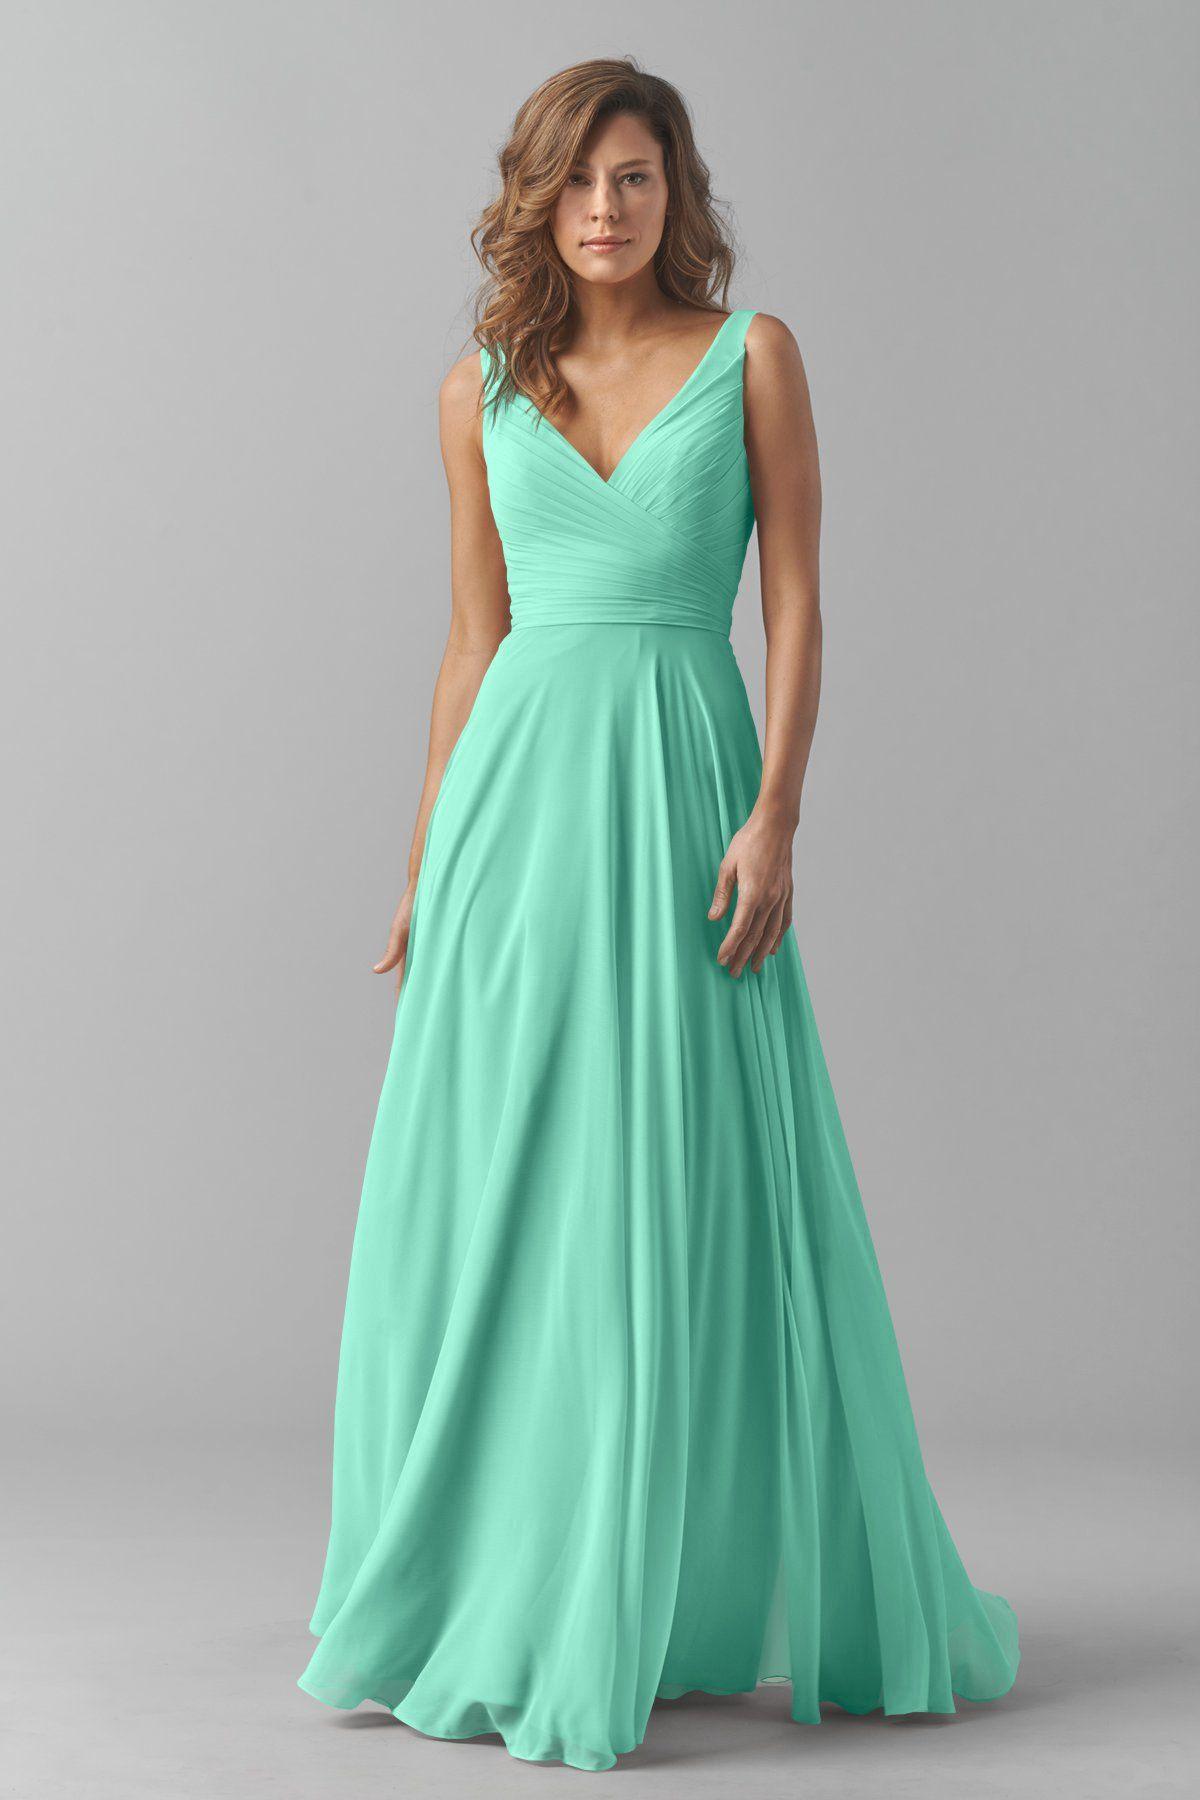 Karen 8542i | Bridesmaids | Watters | Wedding | Pinterest